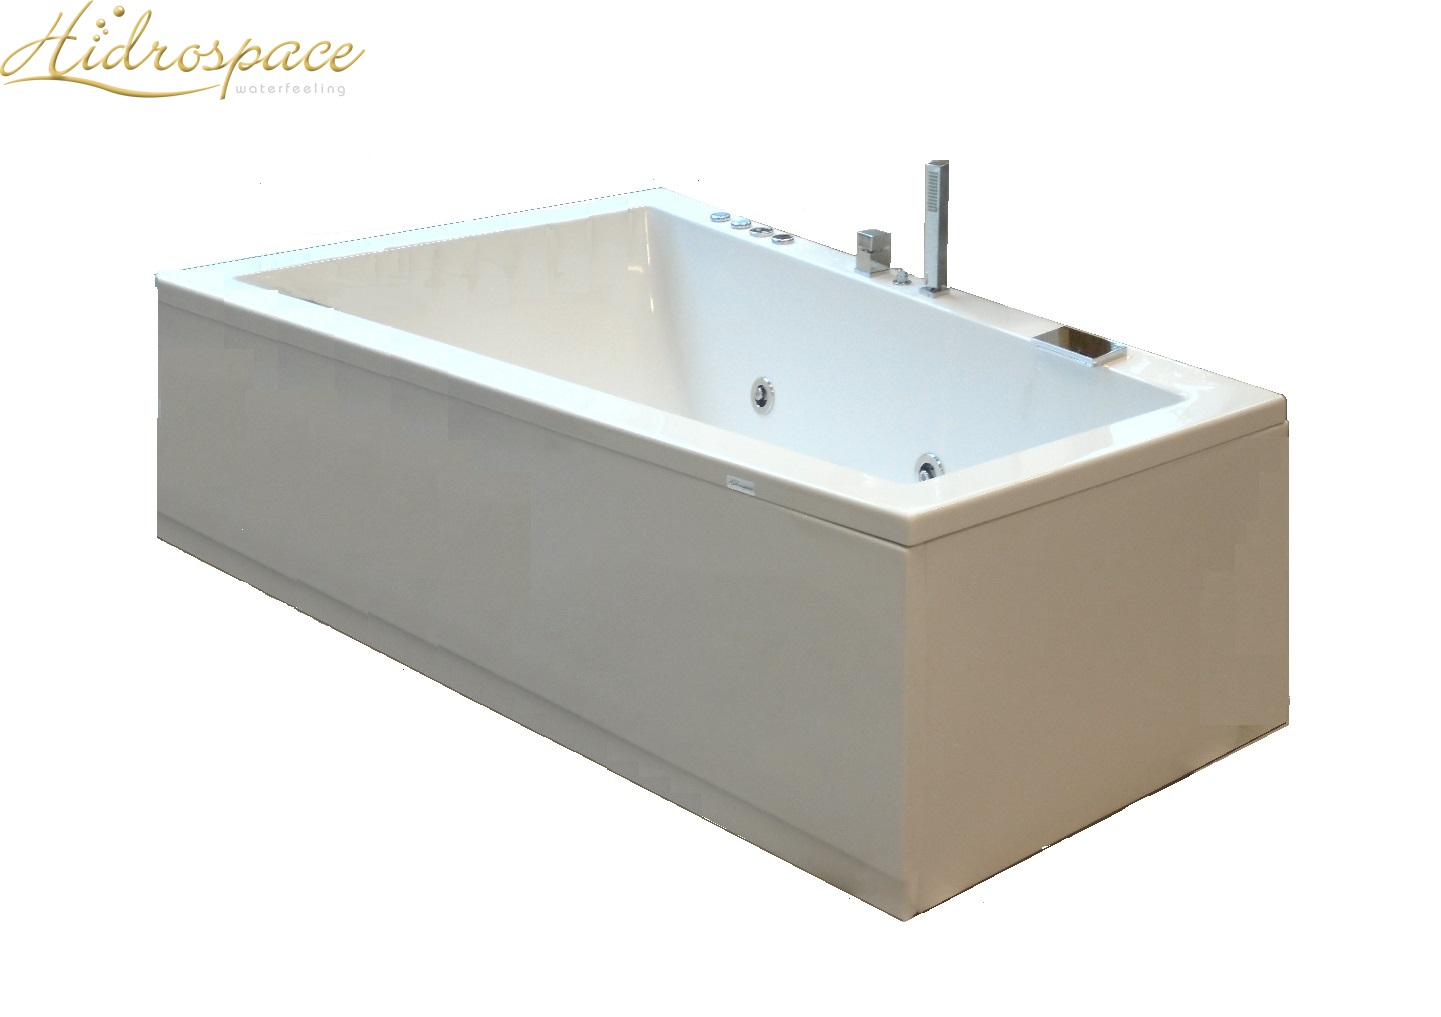 Scheda Tecnica Vasca Da Bagno Da Incasso : Vasca da bagno rettangolare in ghisa da incasso mokka bleu provence